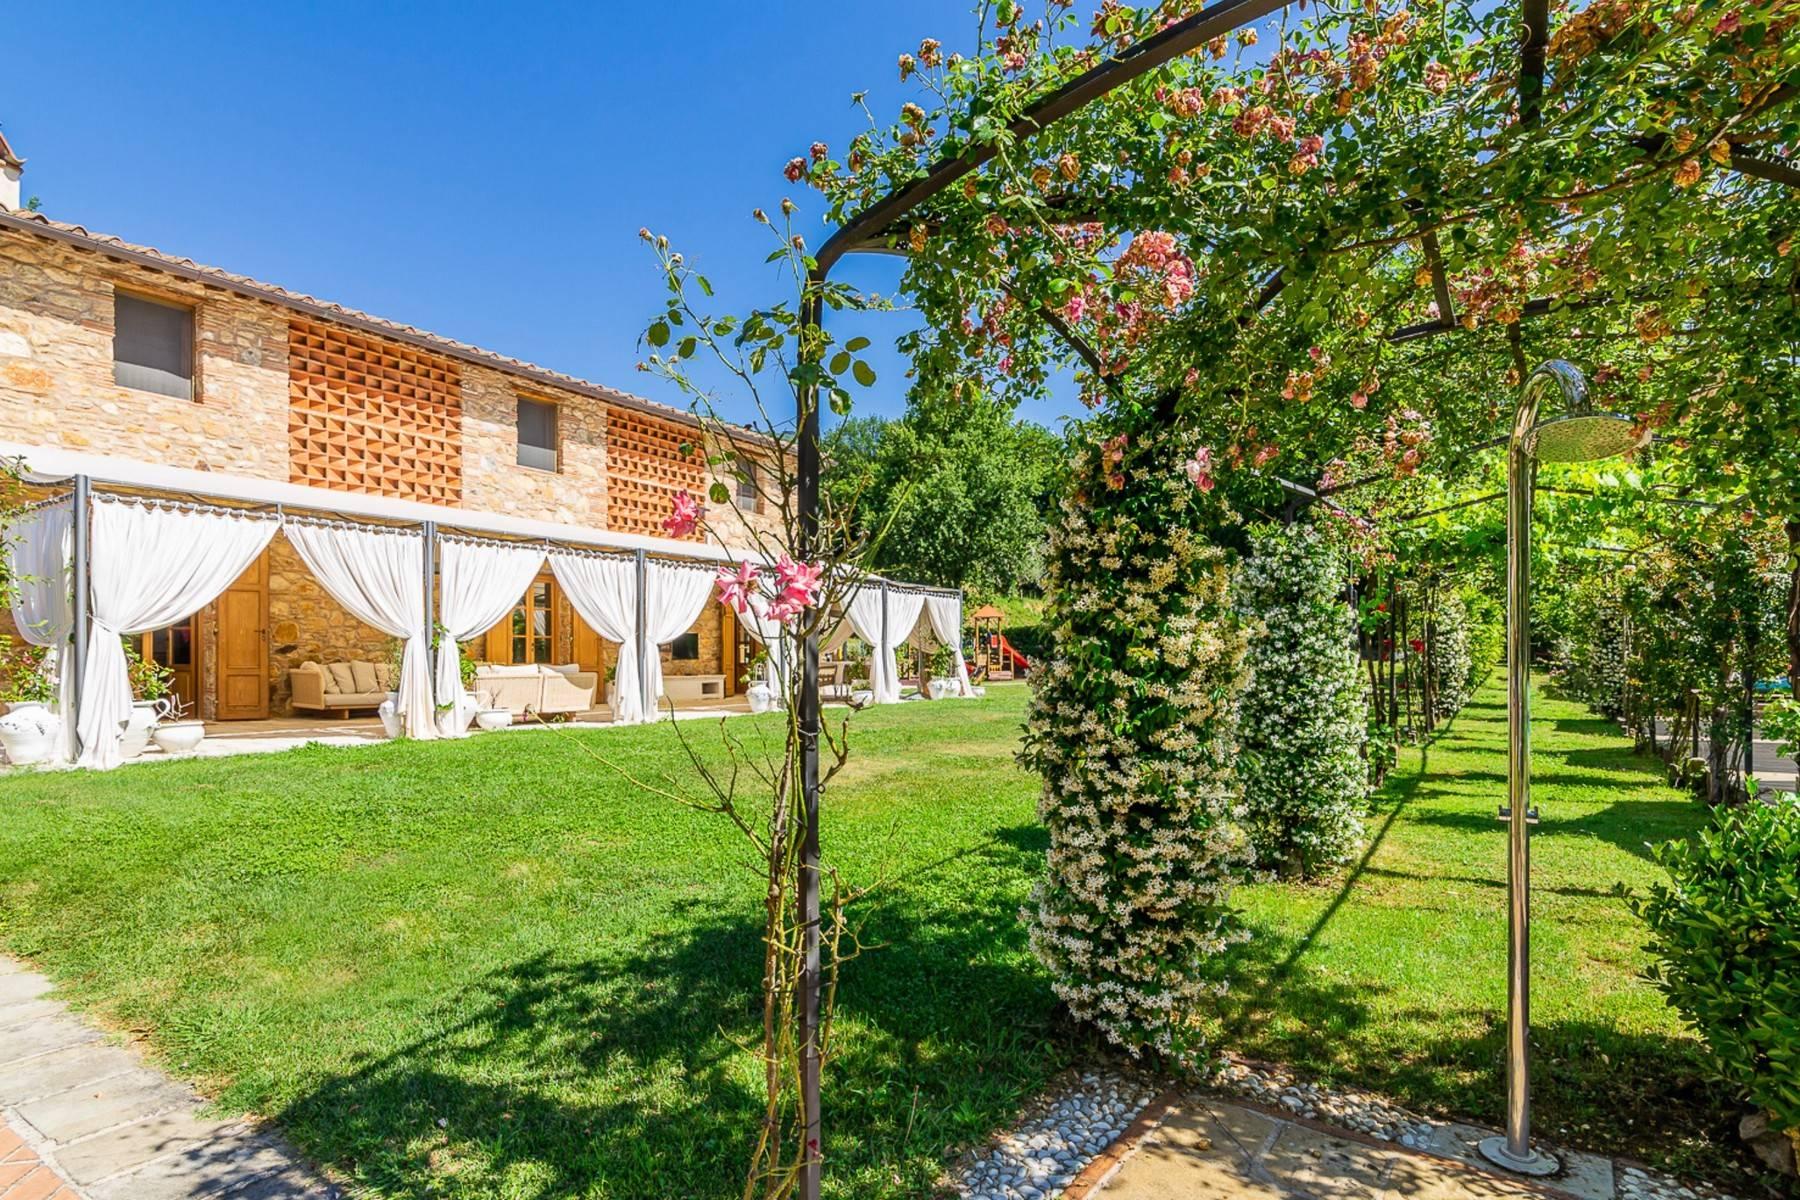 Villa in Vendita a Lucca: 5 locali, 1130 mq - Foto 24